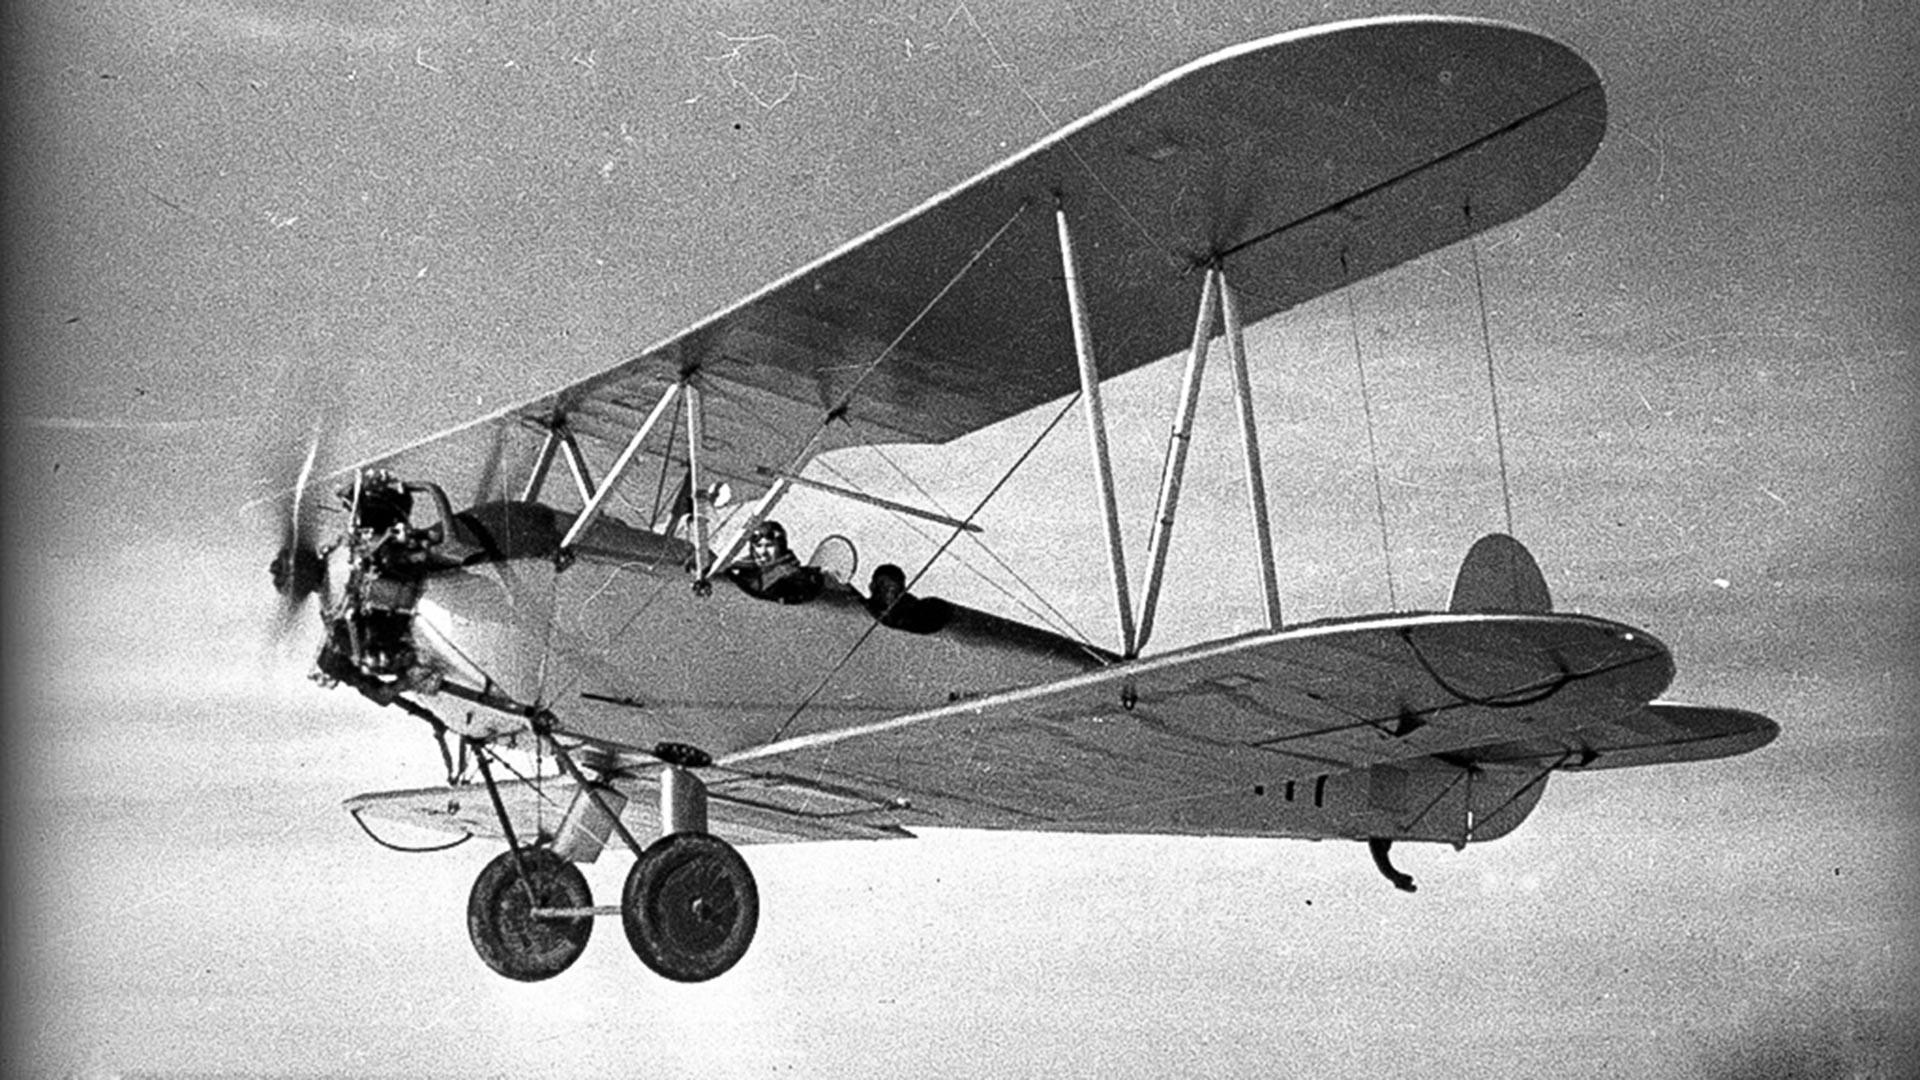 Polikarpov Po-2 (do 1944. nosio naziv U-2).